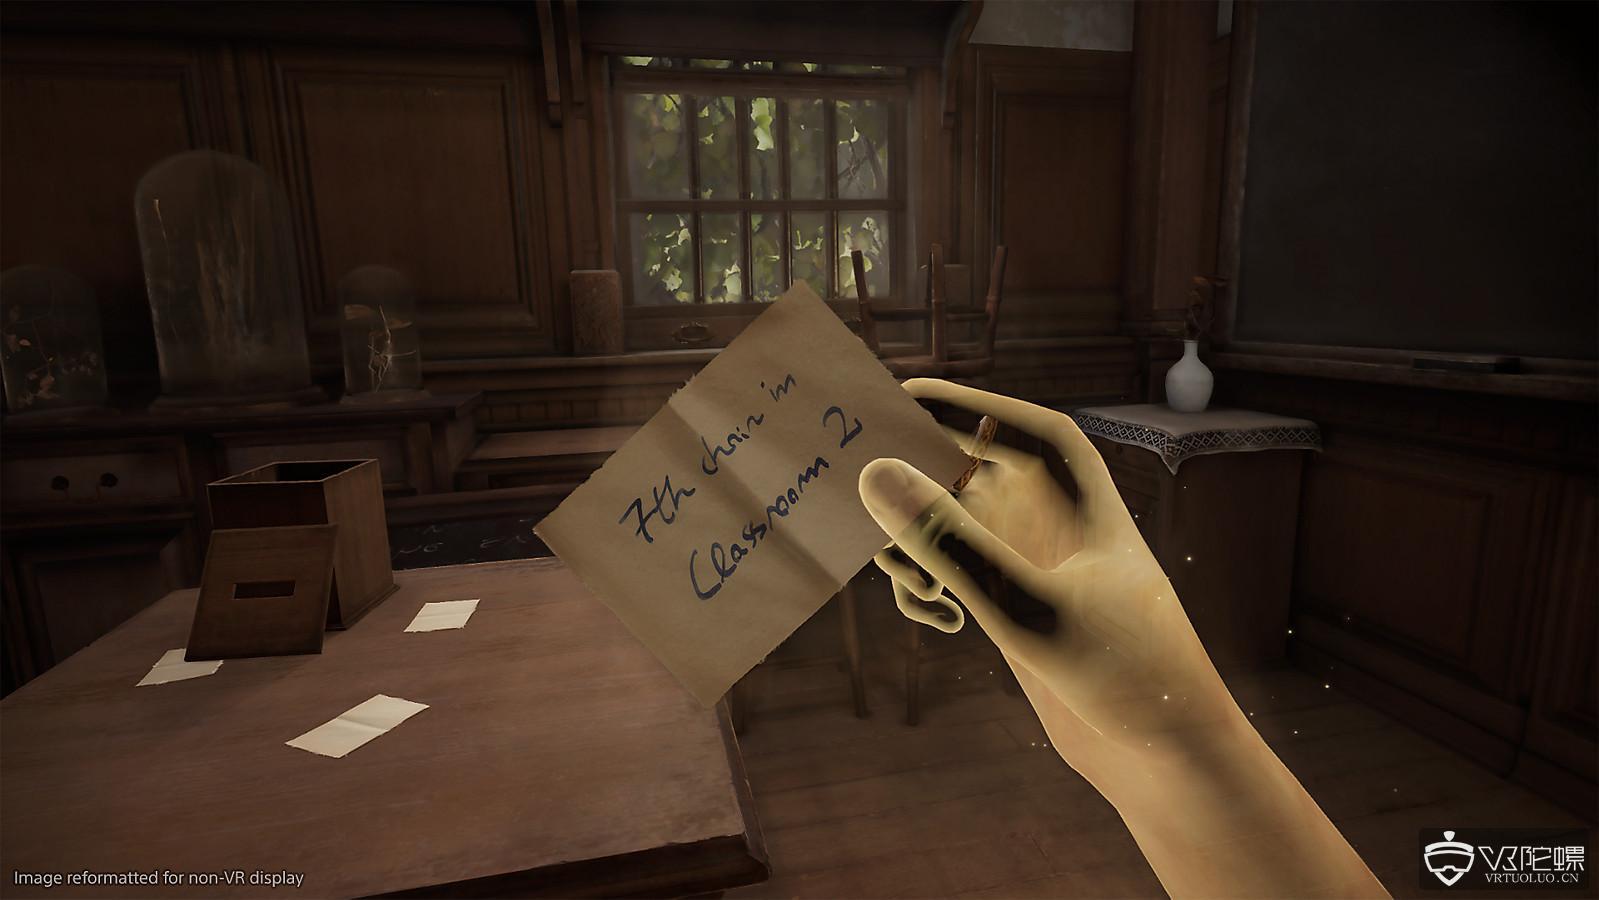 E3巨作《Déraciné》将于11月登陆PS VR